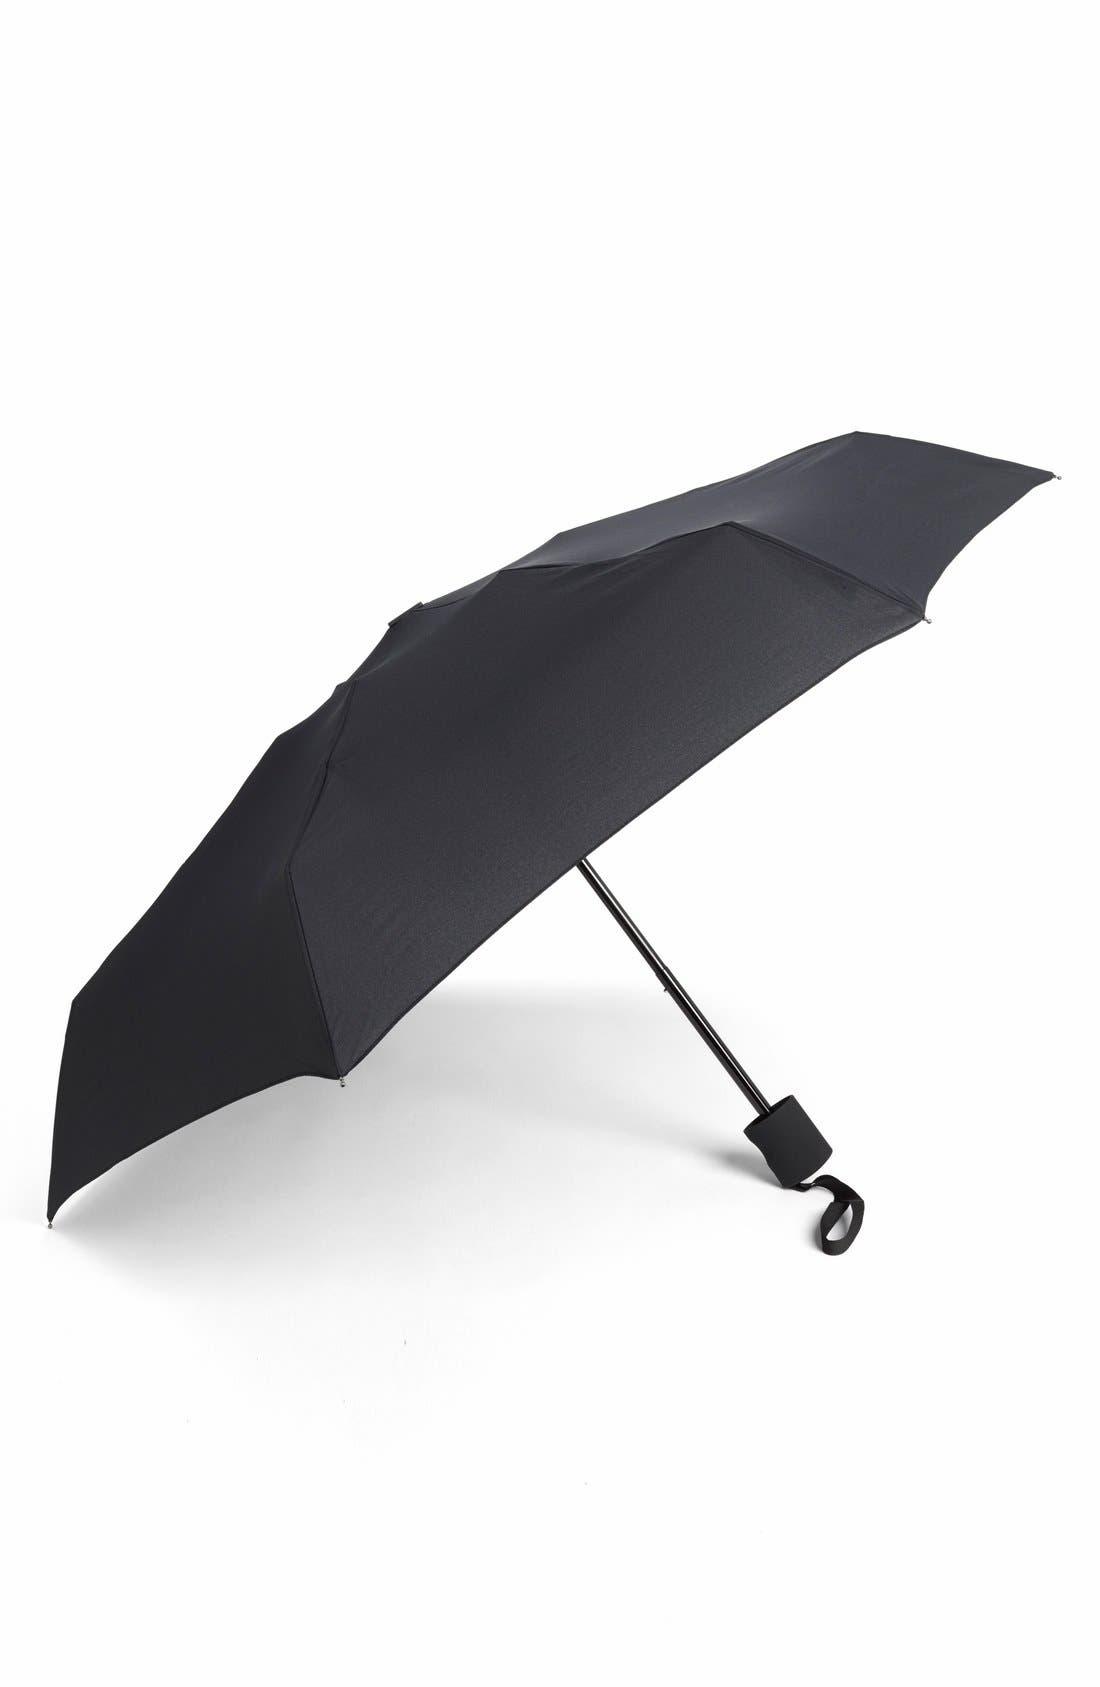 ShedRain Supermini Flat Umbrella